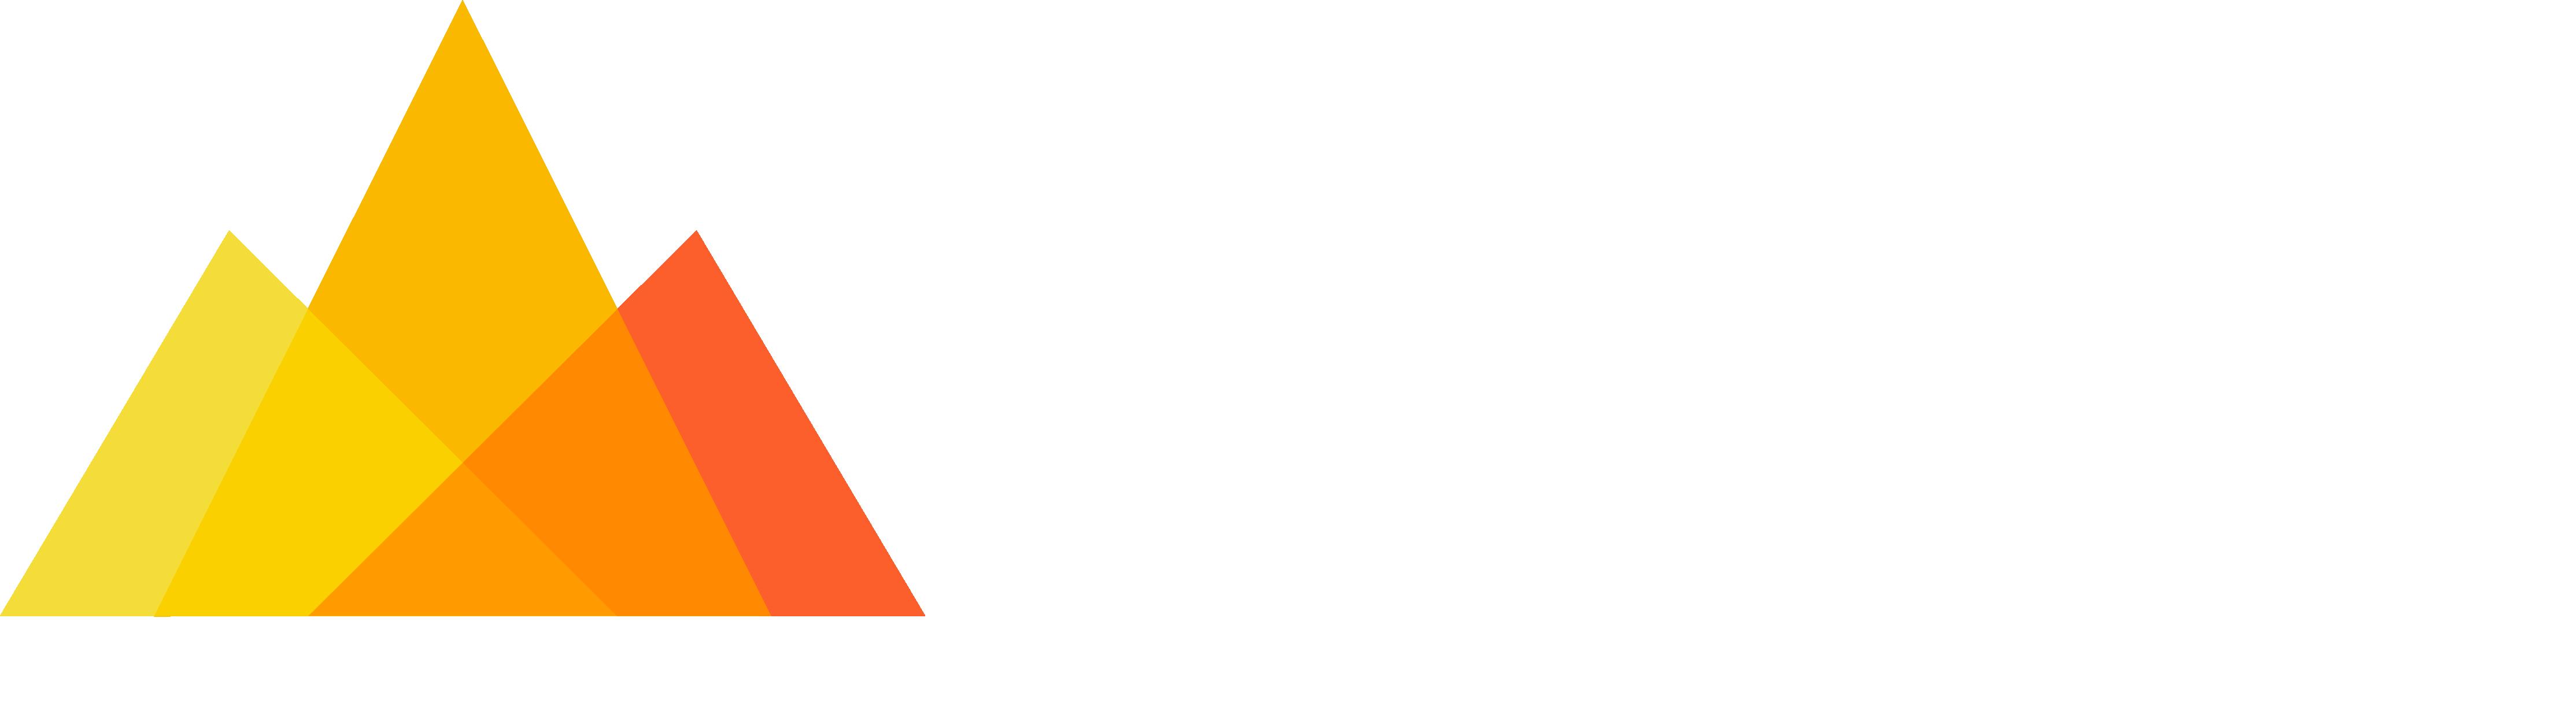 Truelytics-White-Hz-2018.png